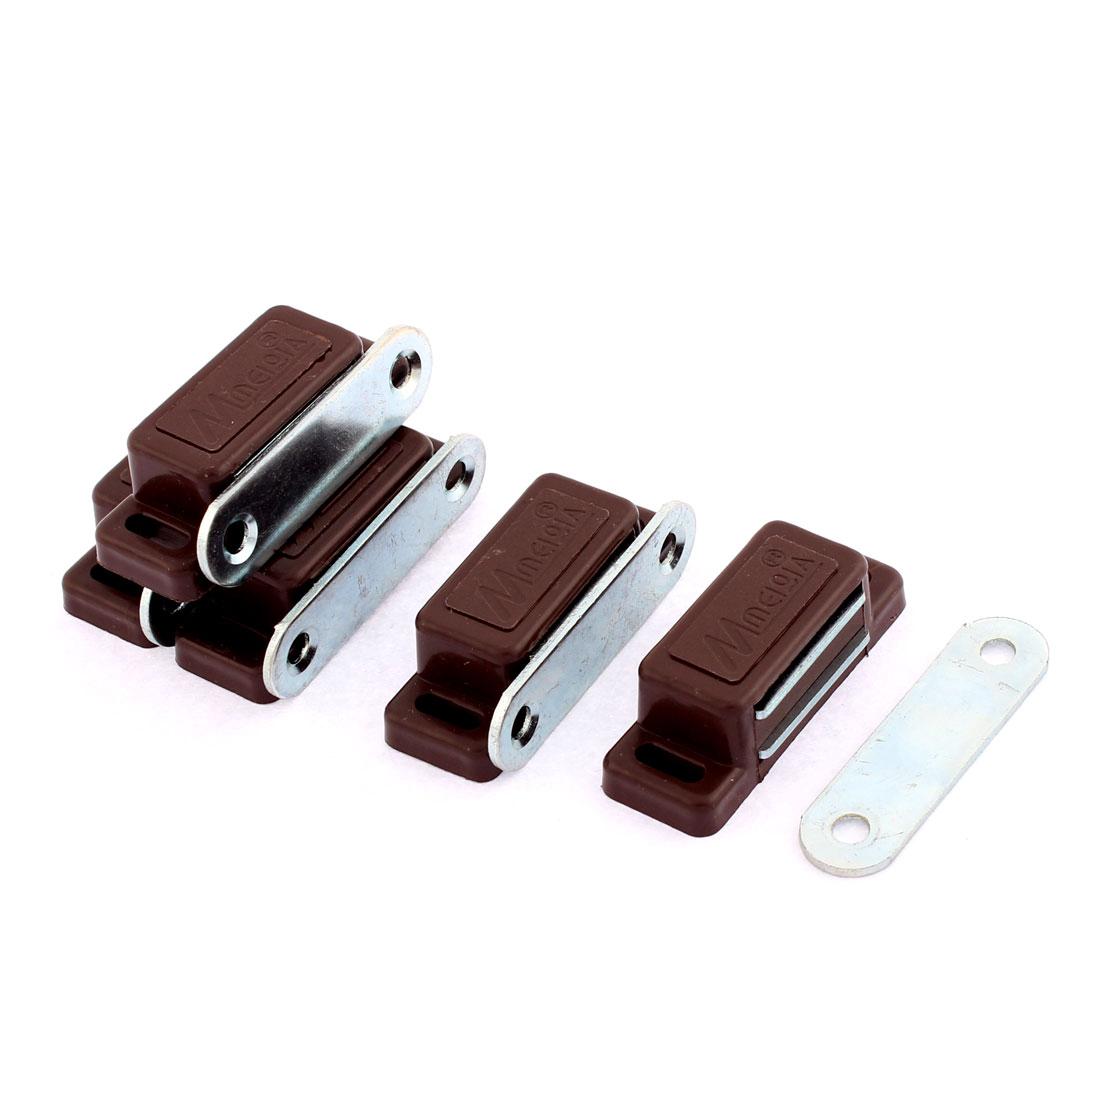 Furniture Magnetic Catch Door Latch 46mm x 17mm Dark Brown 5 Pcs